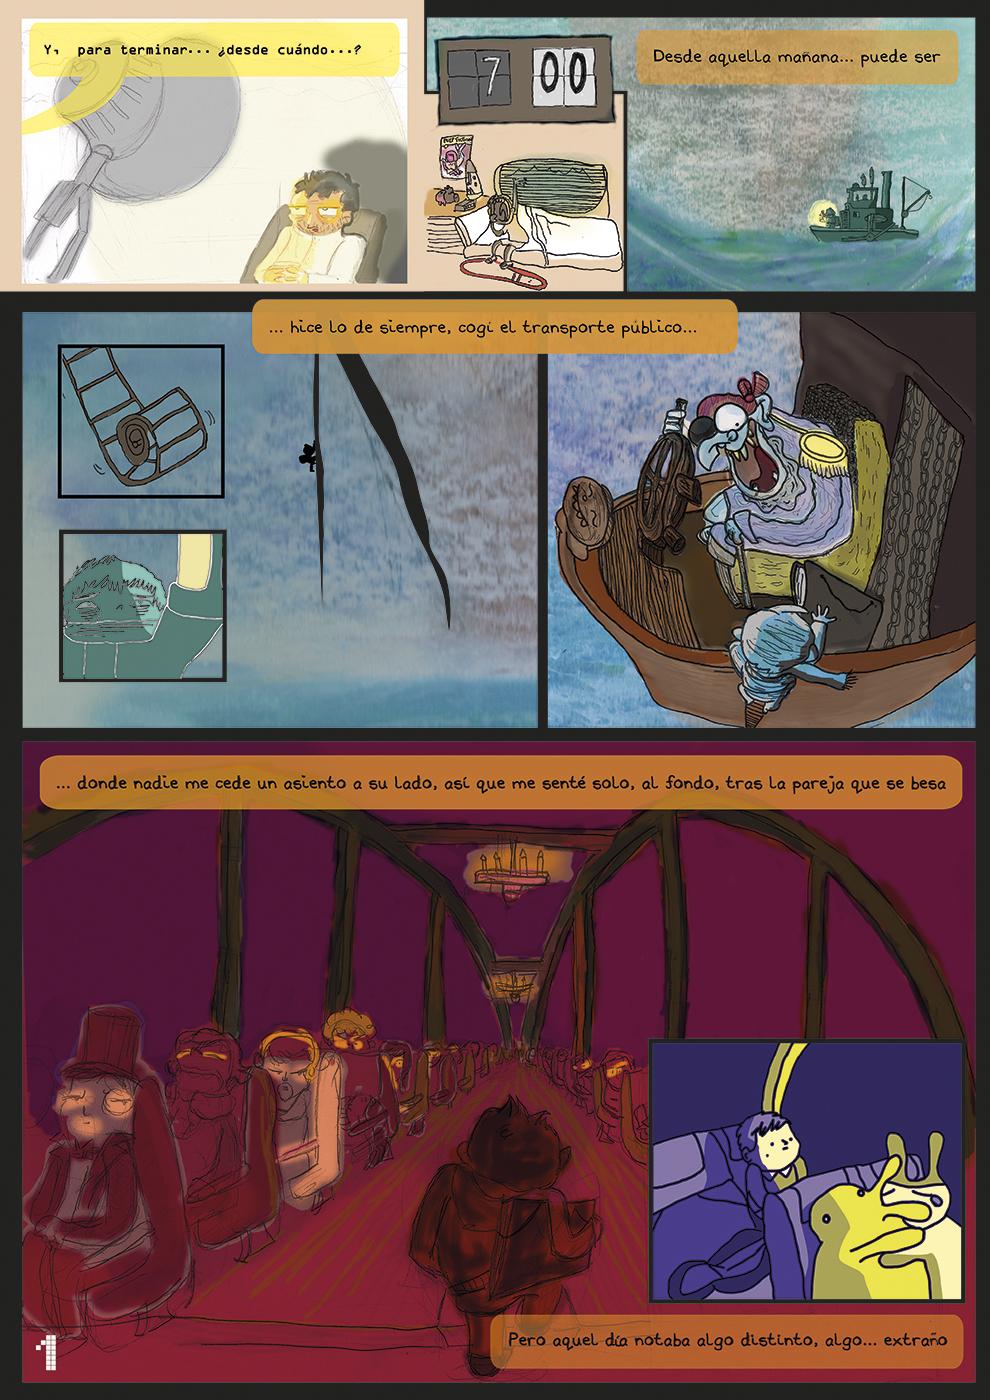 Pagina primera